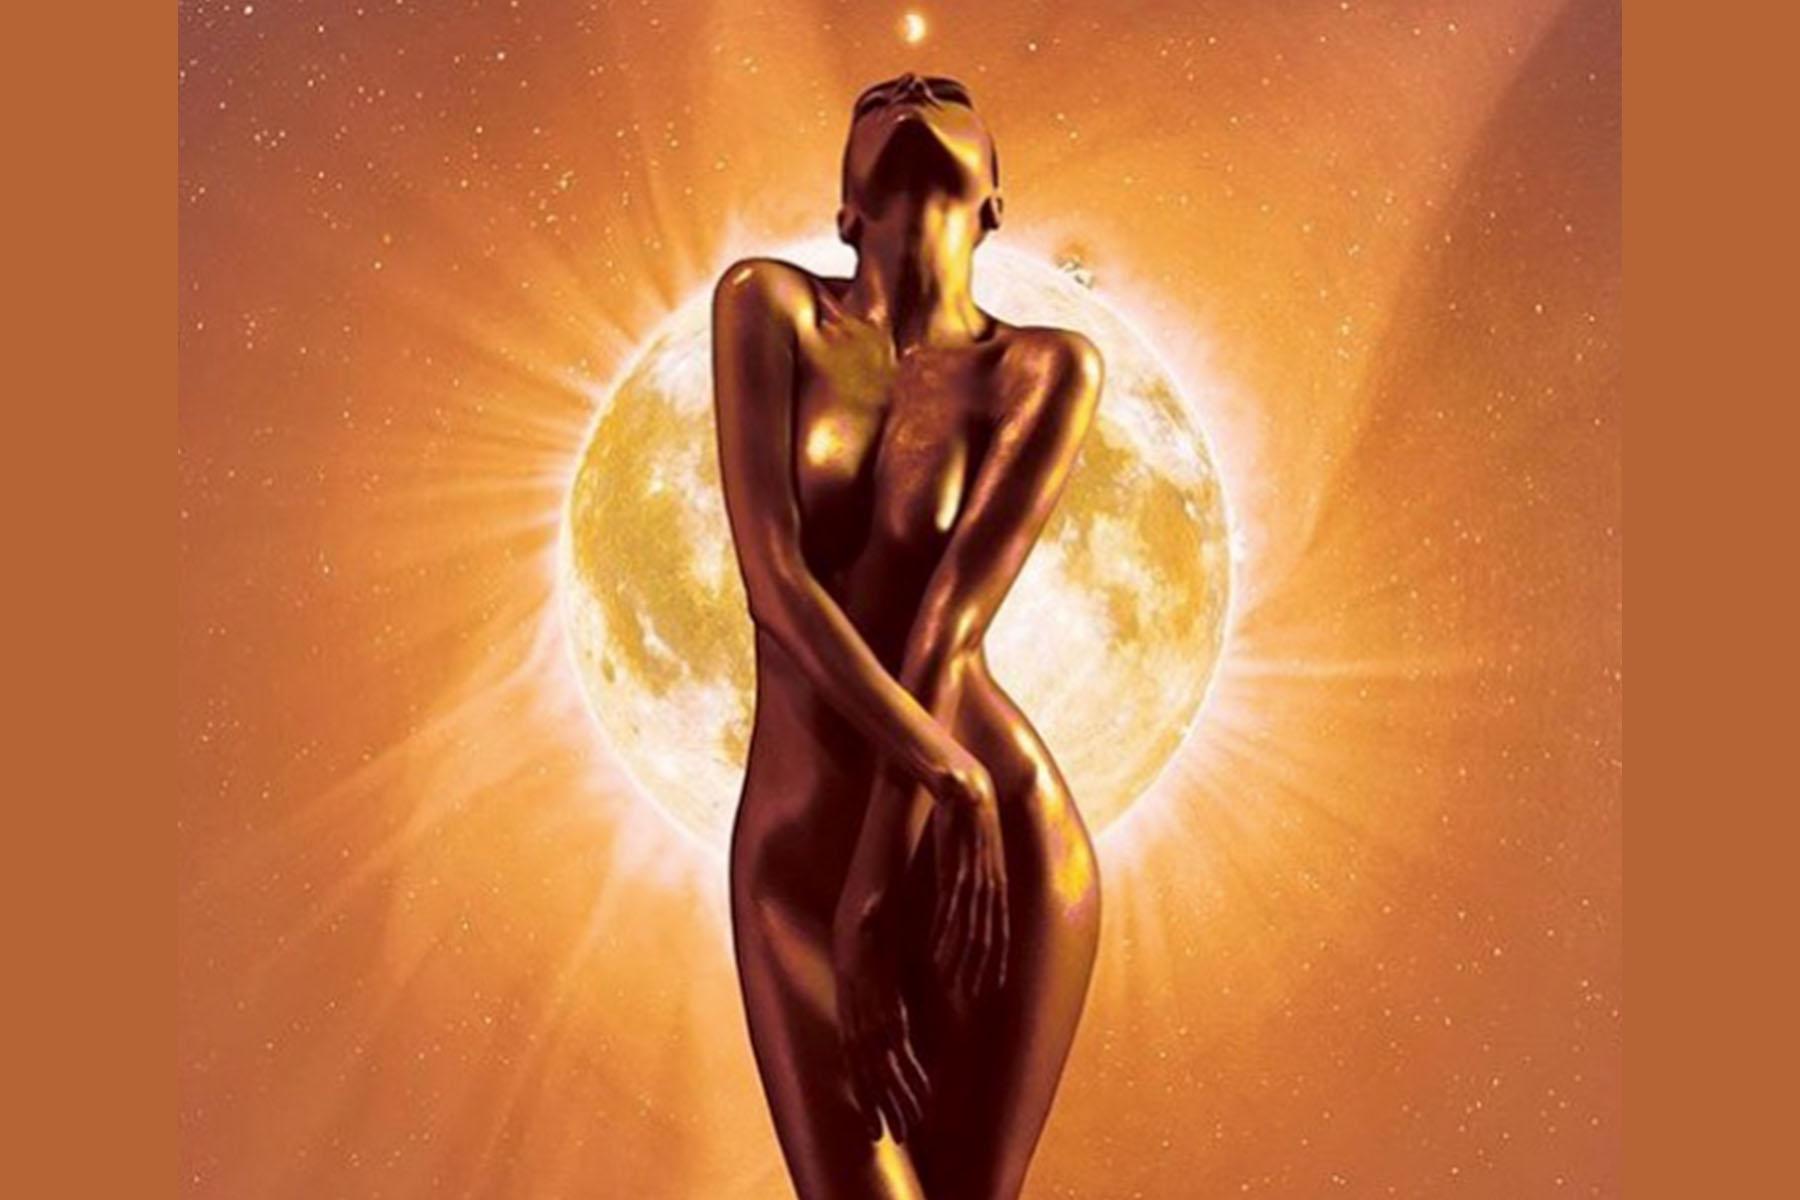 Your October Love & Sex Horoscope: Scorpio Power Within